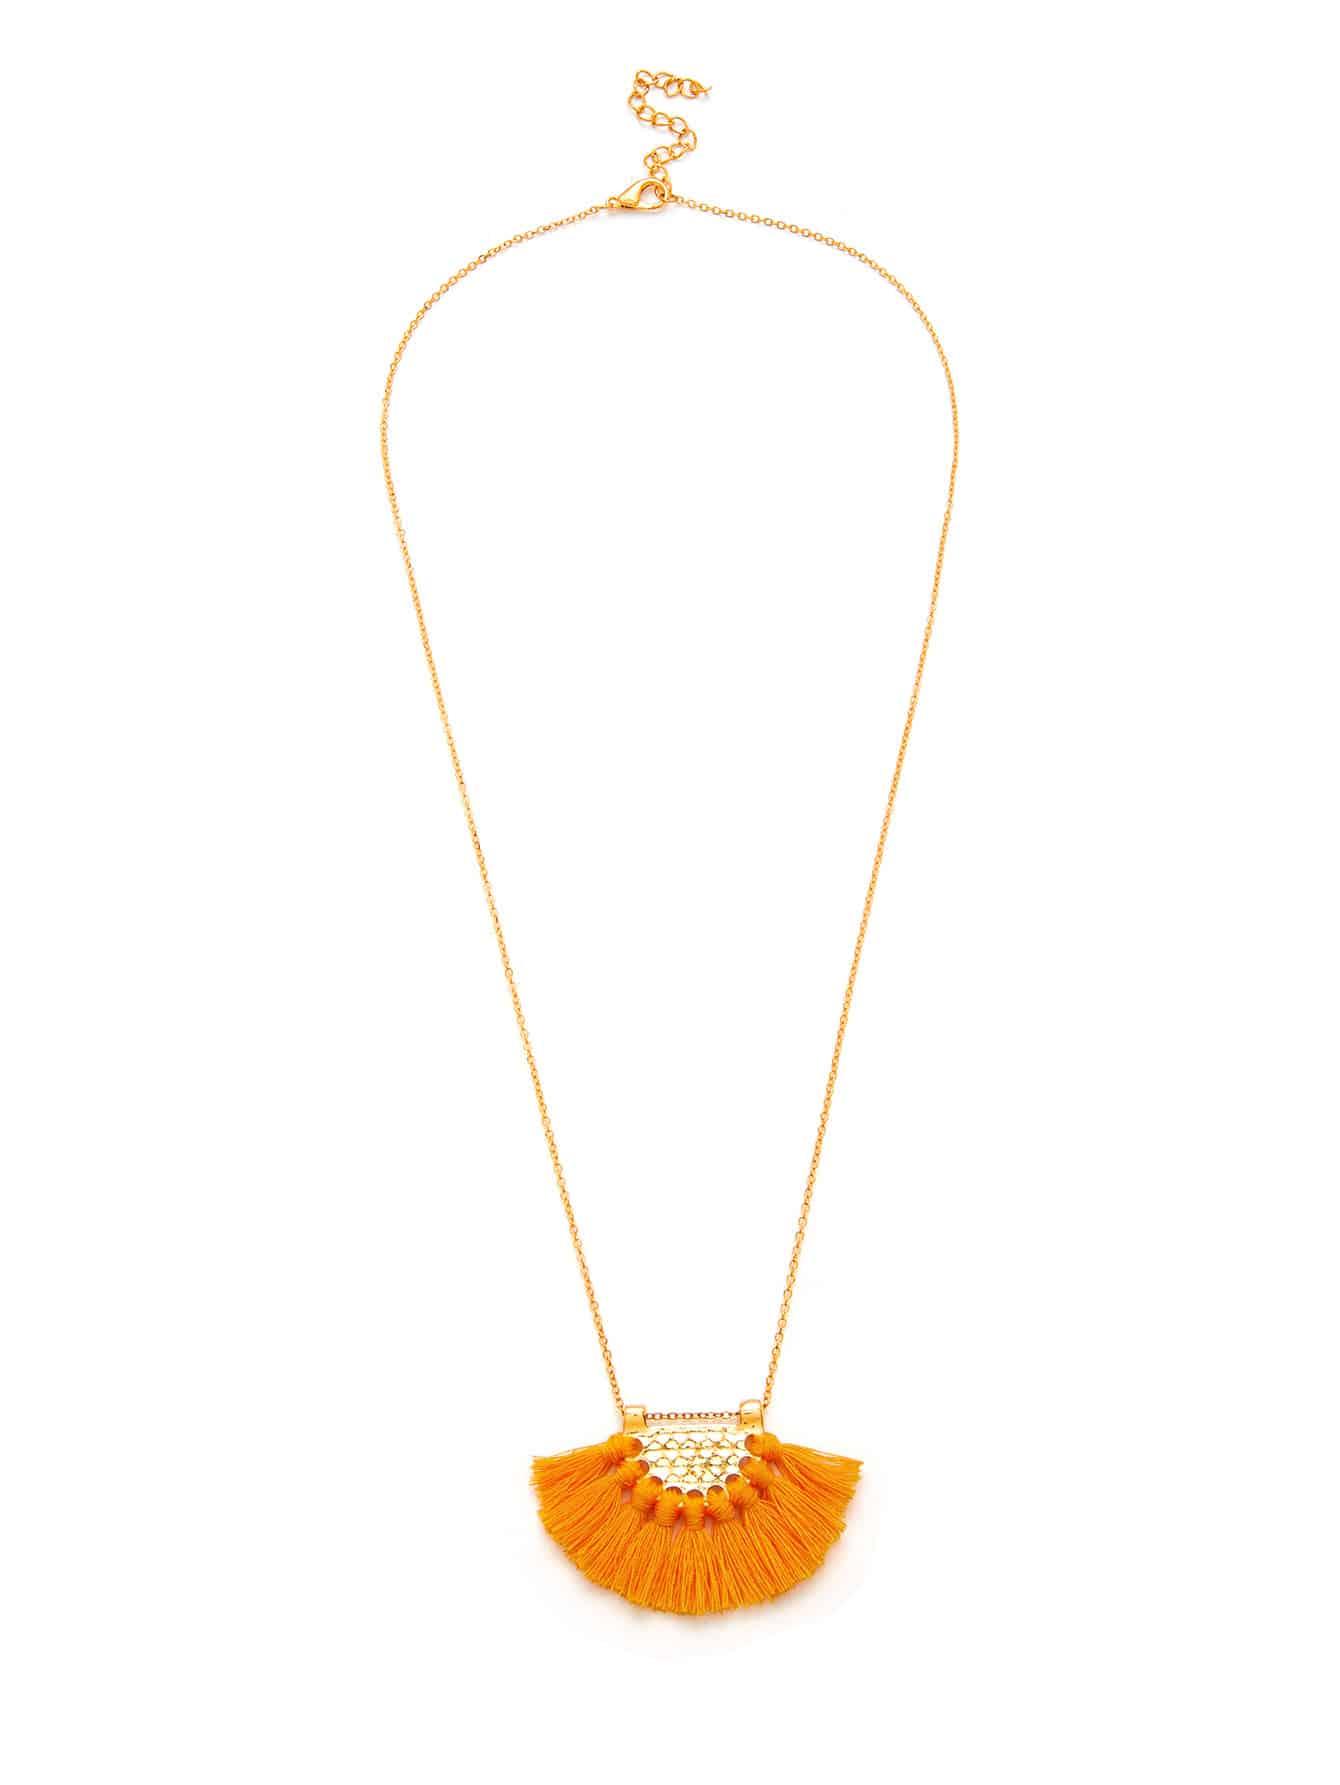 Tassel Pendant Chain Necklace